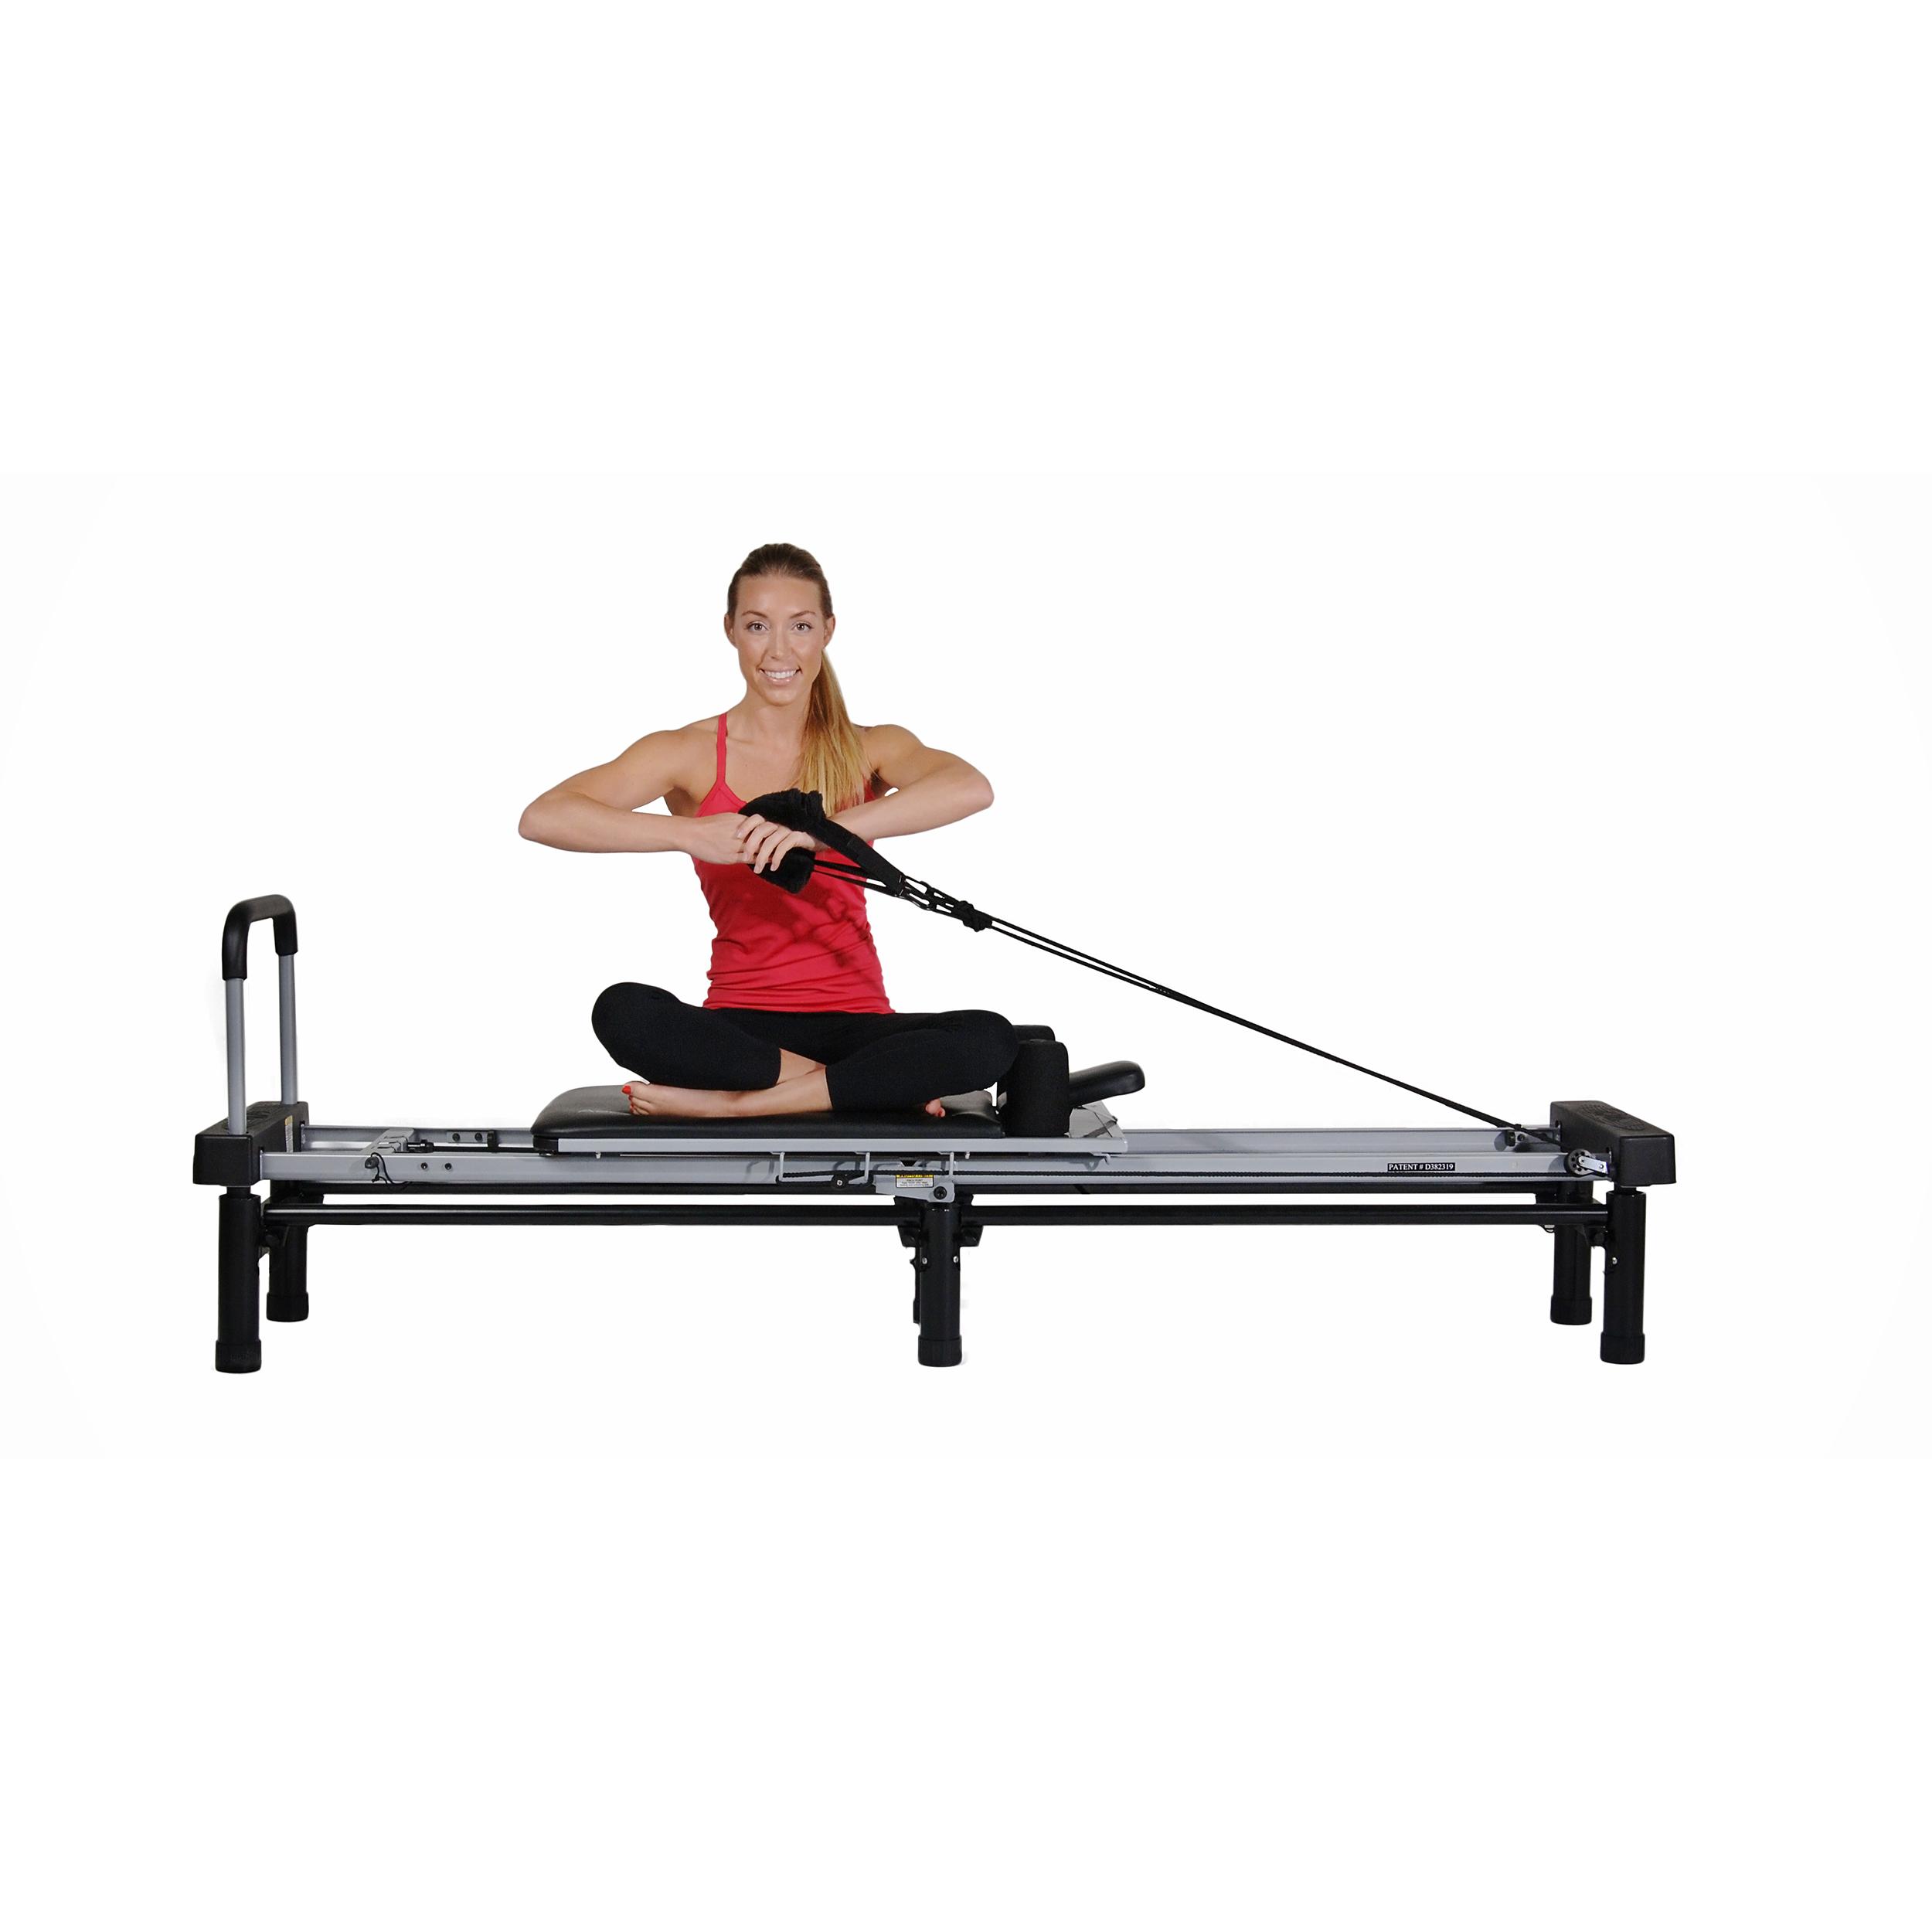 aero pilates xp 610 manual